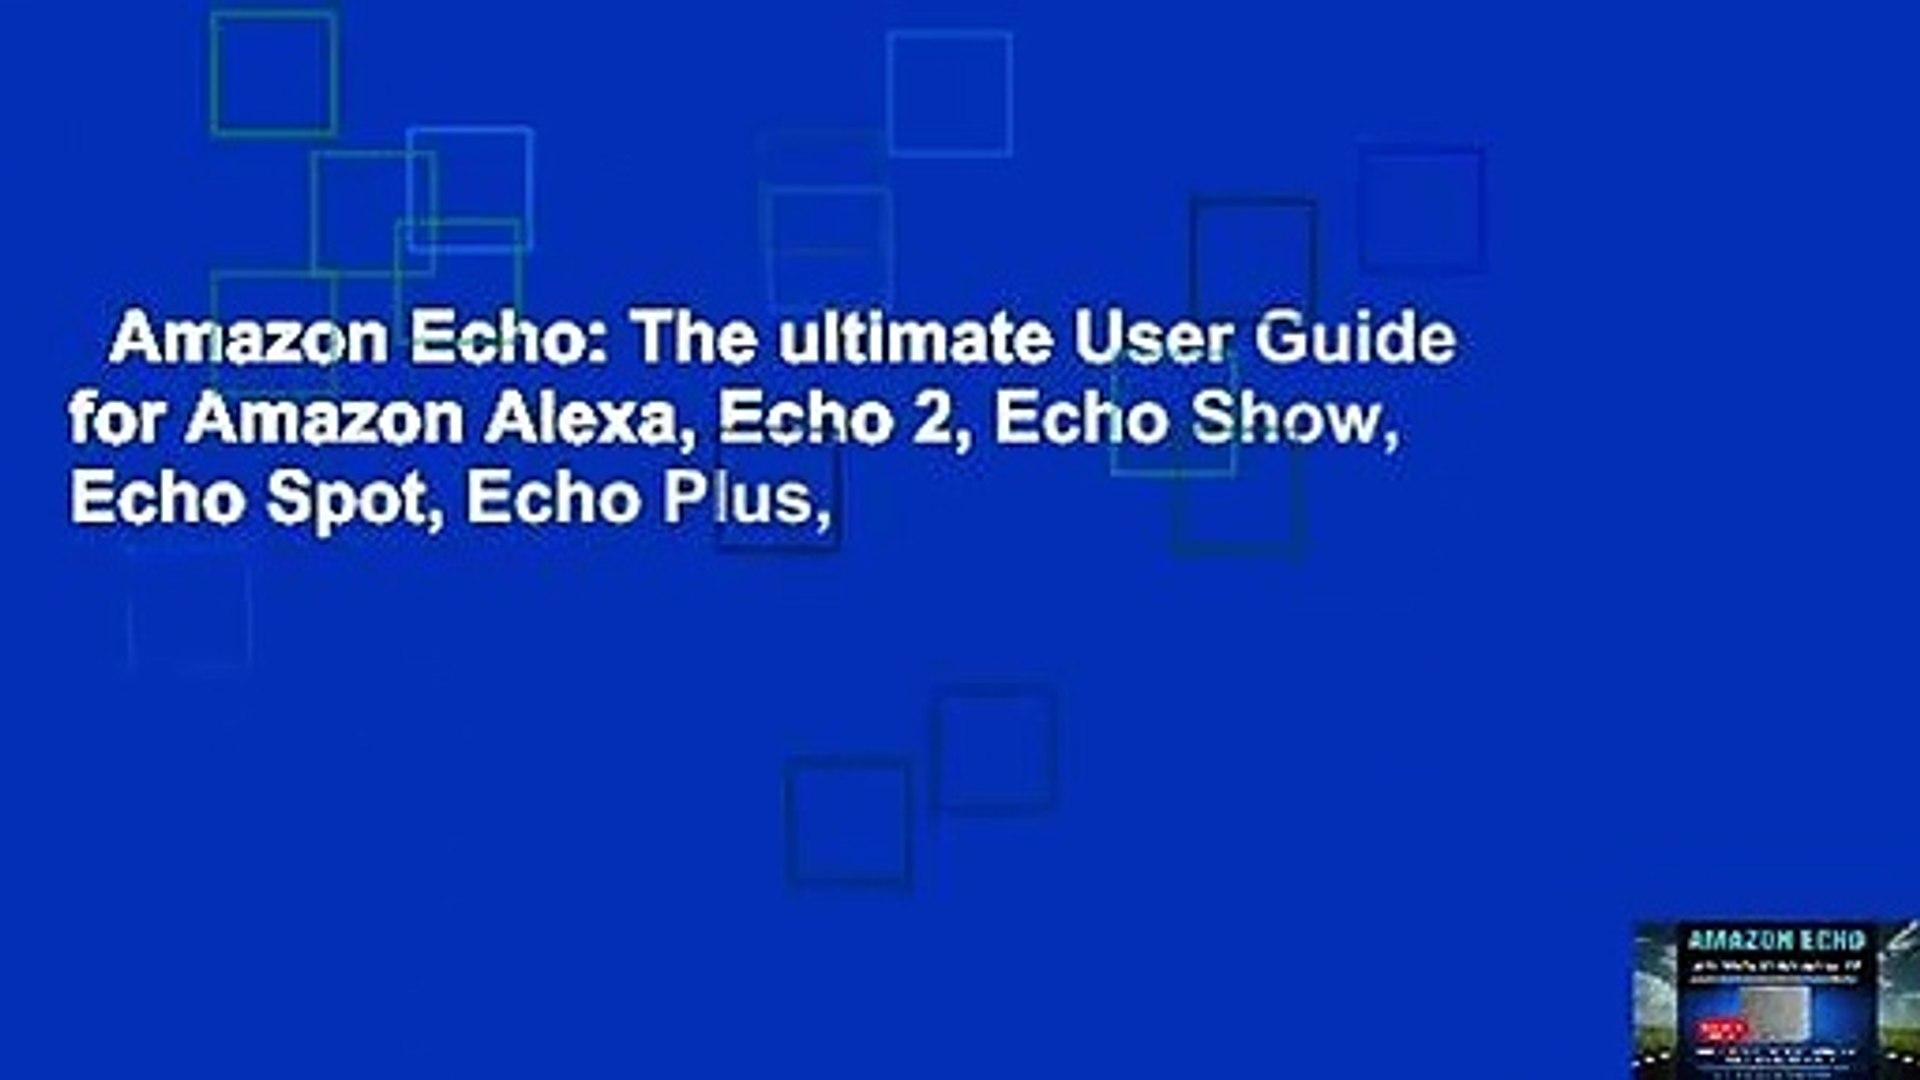 Amazon Echo: The ultimate User Guide for Amazon Alexa, Echo 2, Echo Show, Echo Spot, Echo Plus,